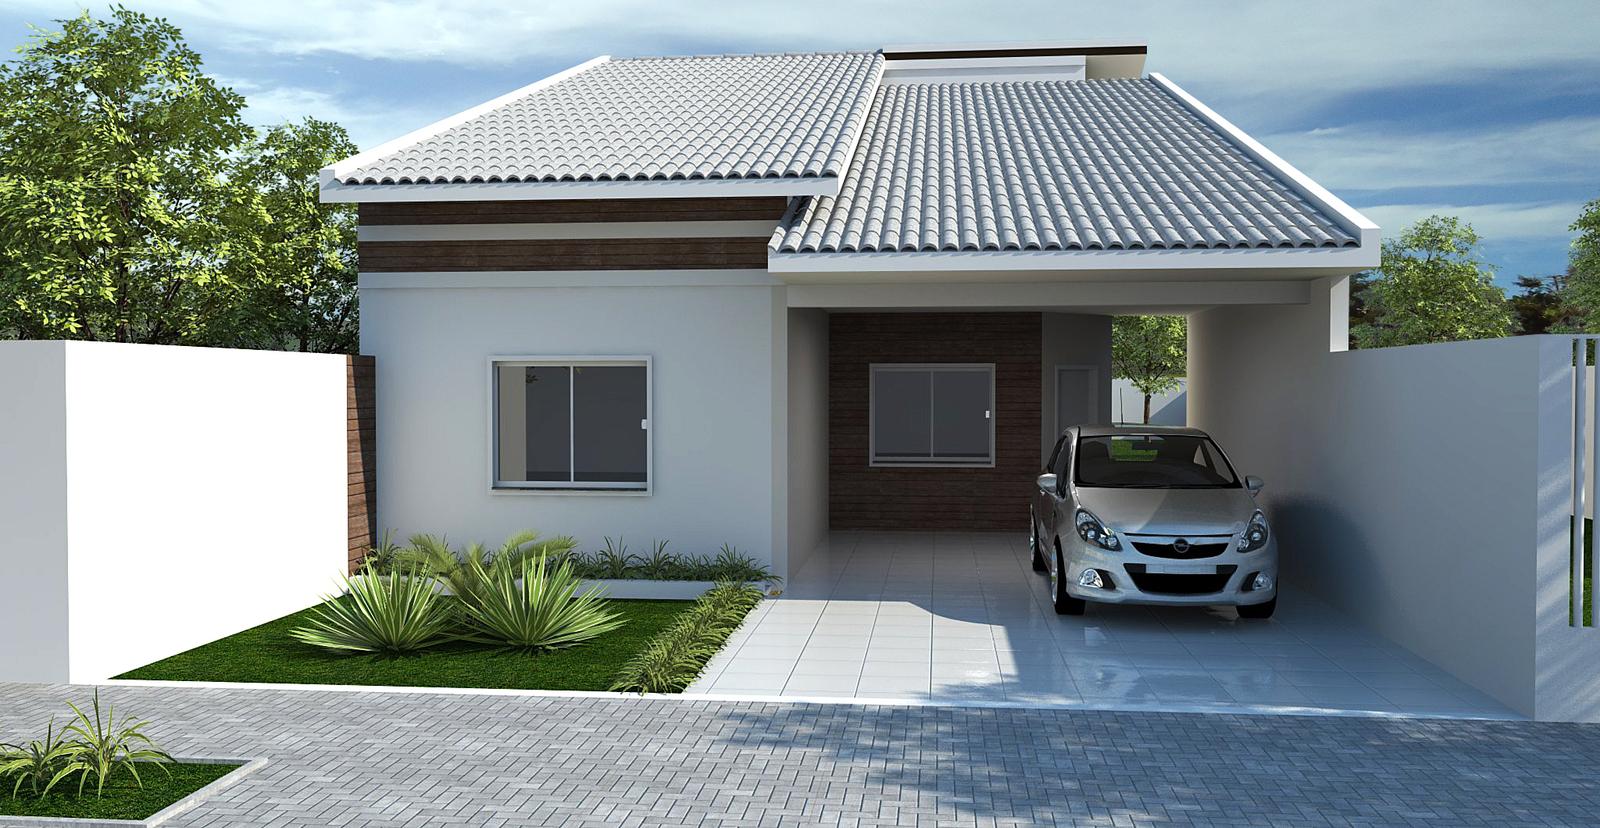 Fachadas de casas pequenas e simples 11 modelos for Modelos jardines para casas pequenas